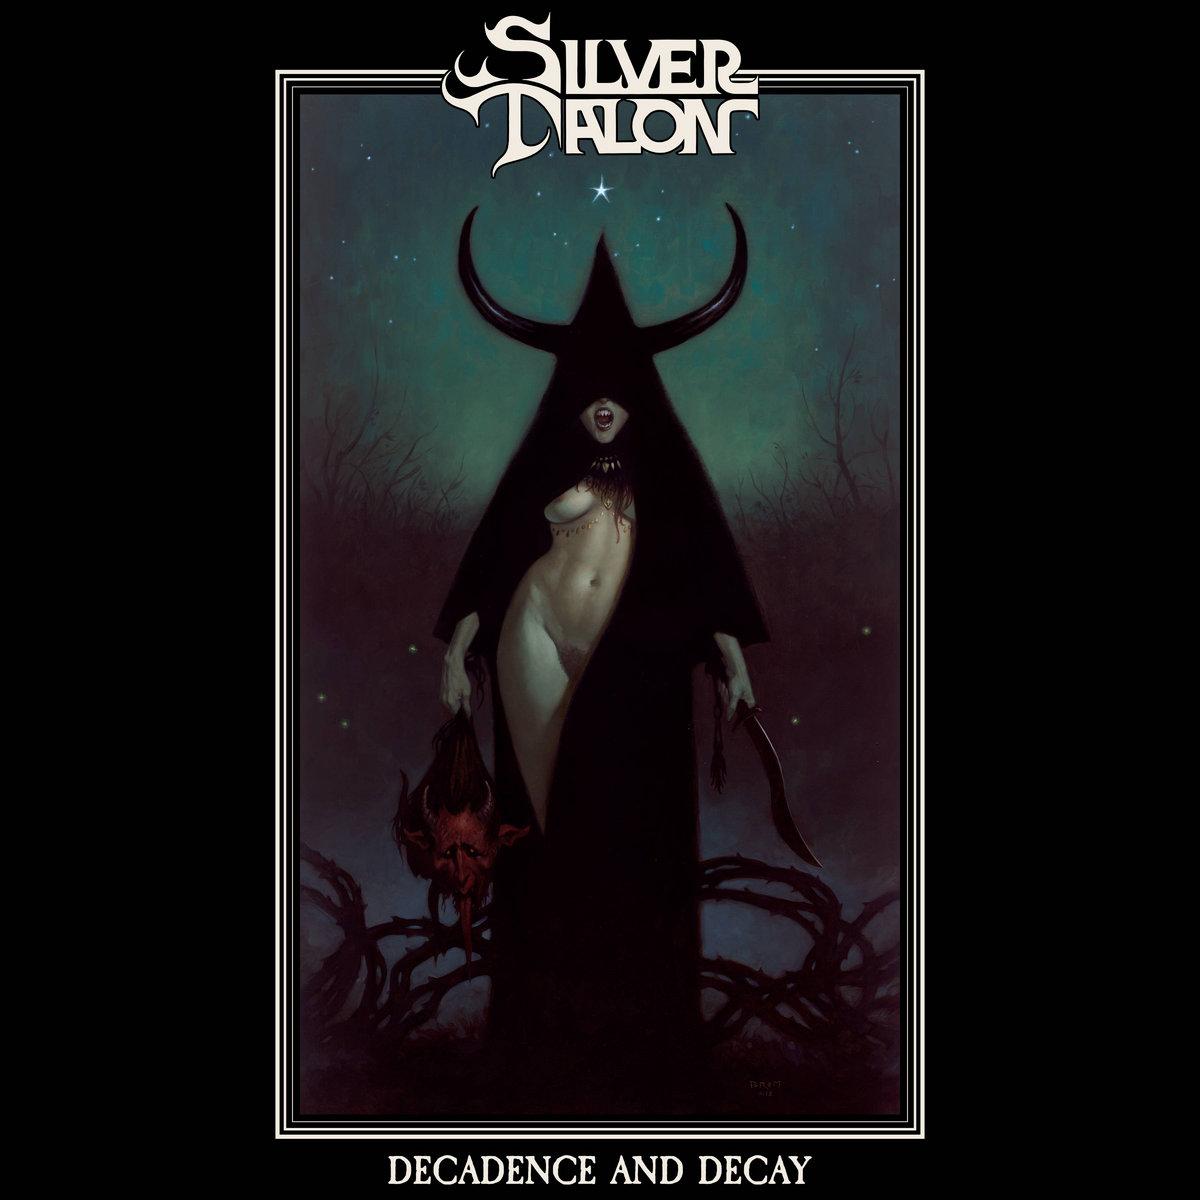 silver talon - decadence and decay